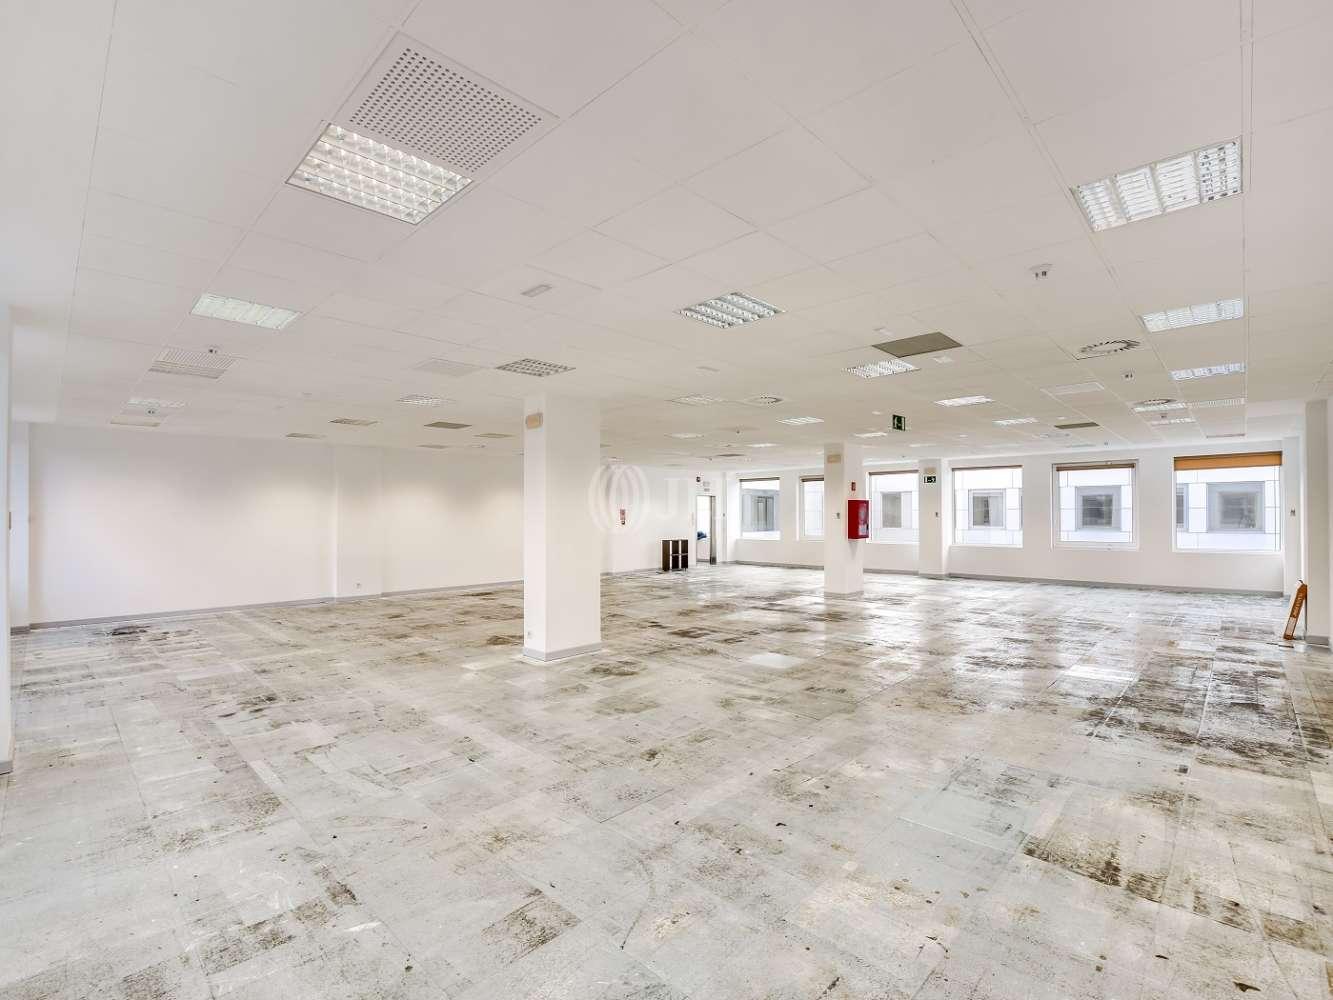 Oficina Las rozas de madrid, 28232 - Edificio 3. P.E. Alvia - 14362